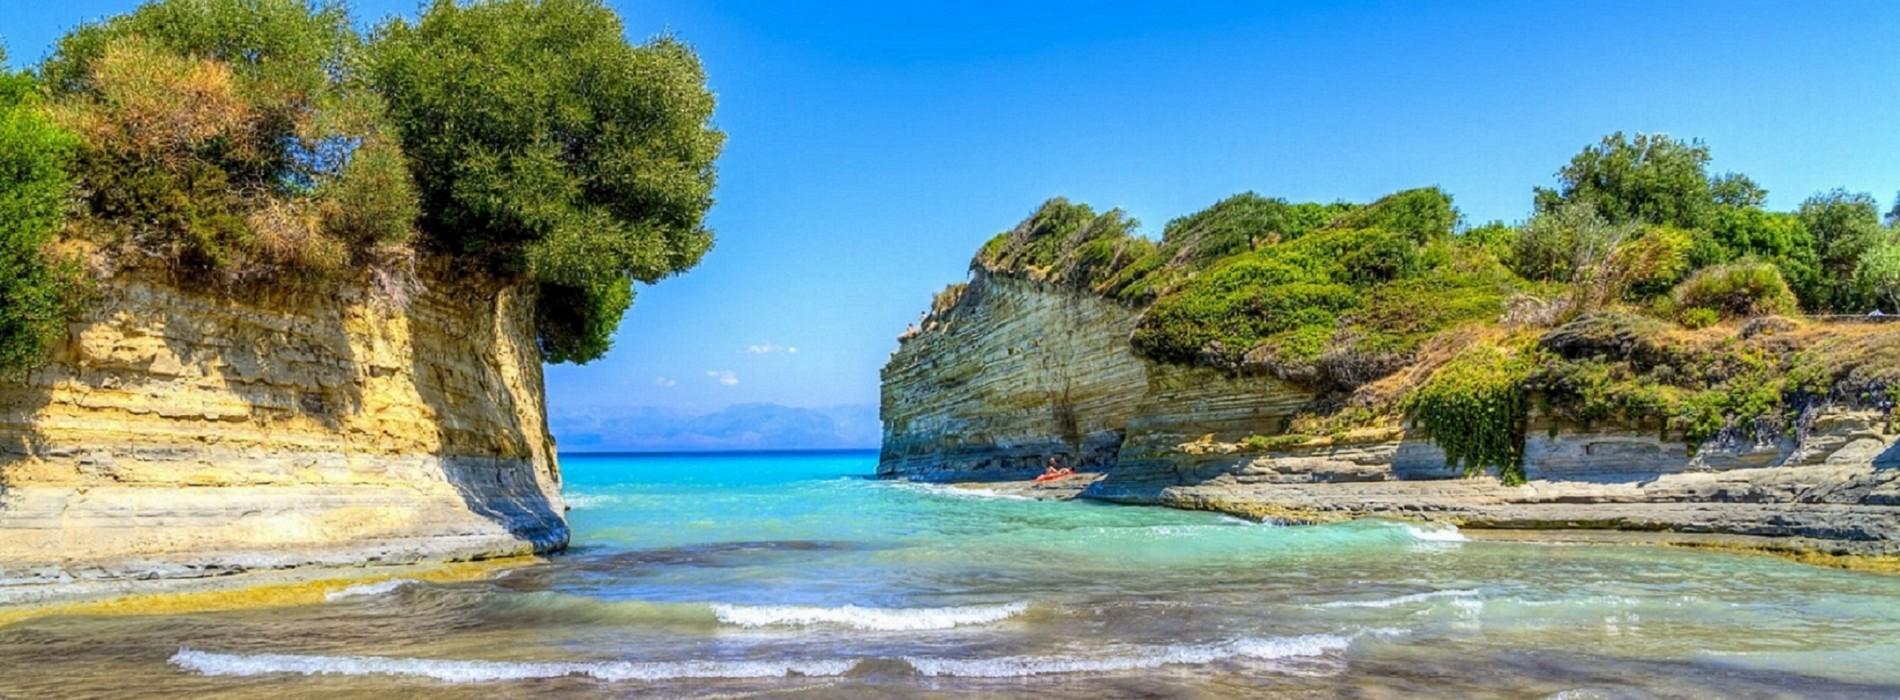 Romancing in Greece